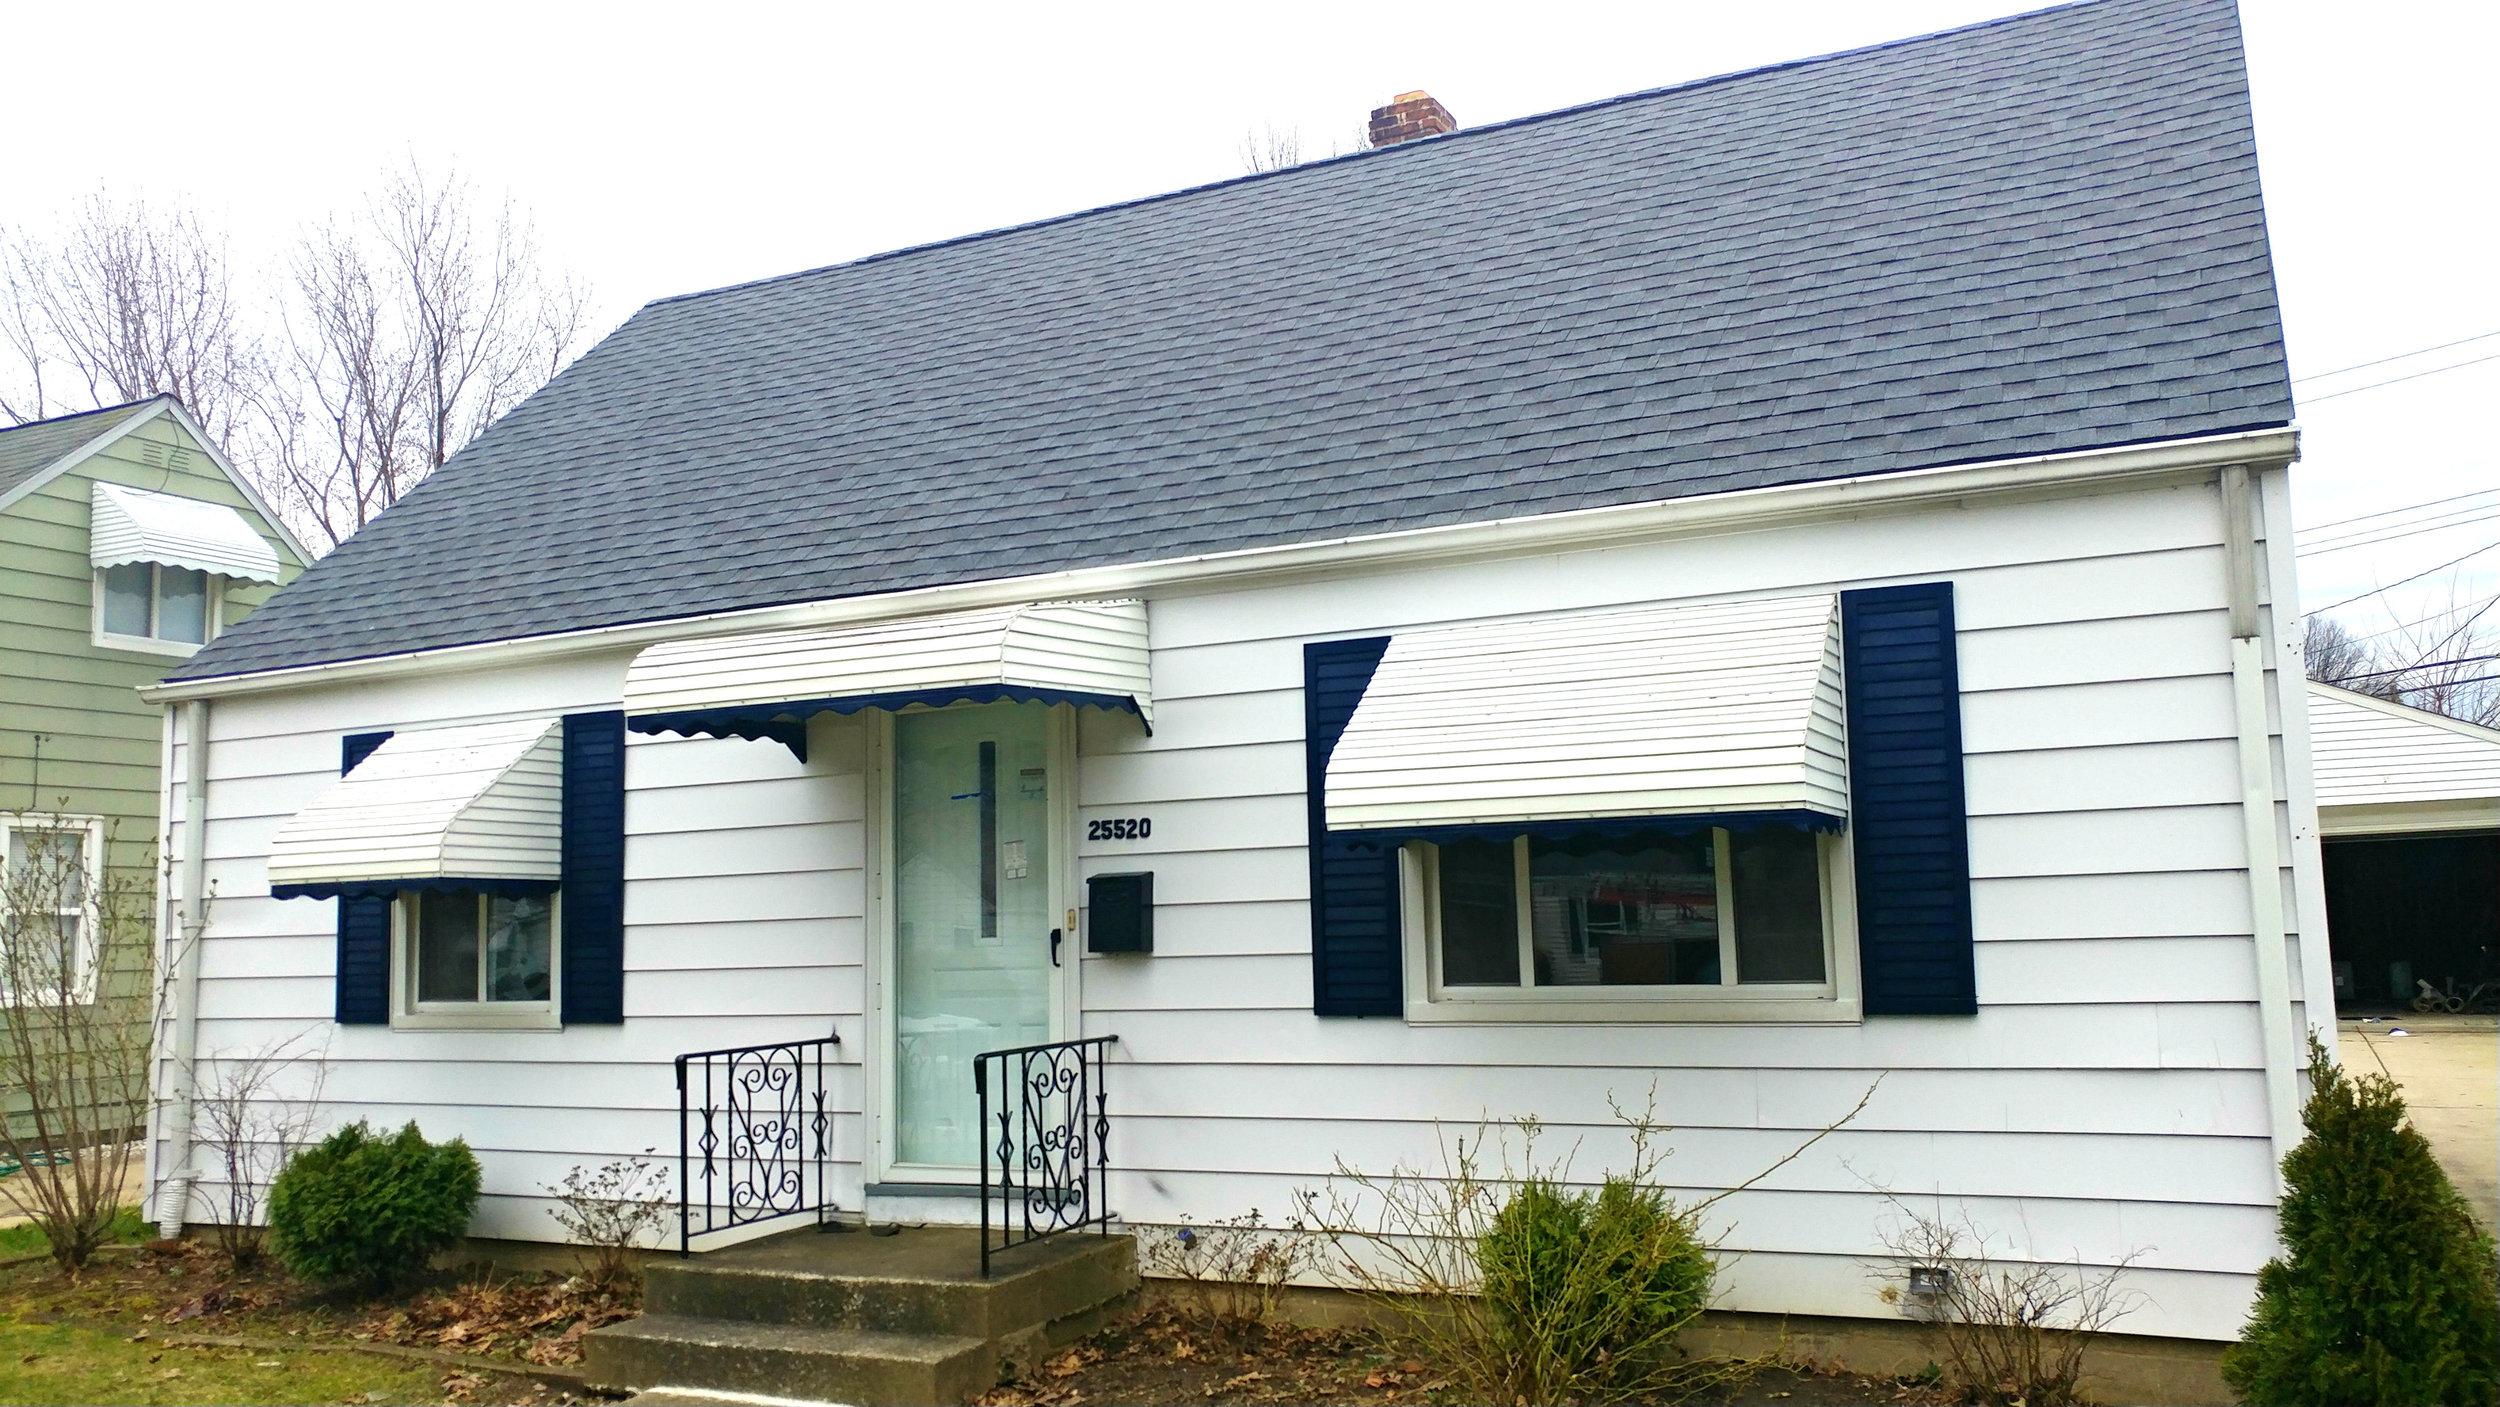 25520 Richards Ave., Euclid | 4 bed 1 bath | 1,184 Sq. Ft. | $51,000